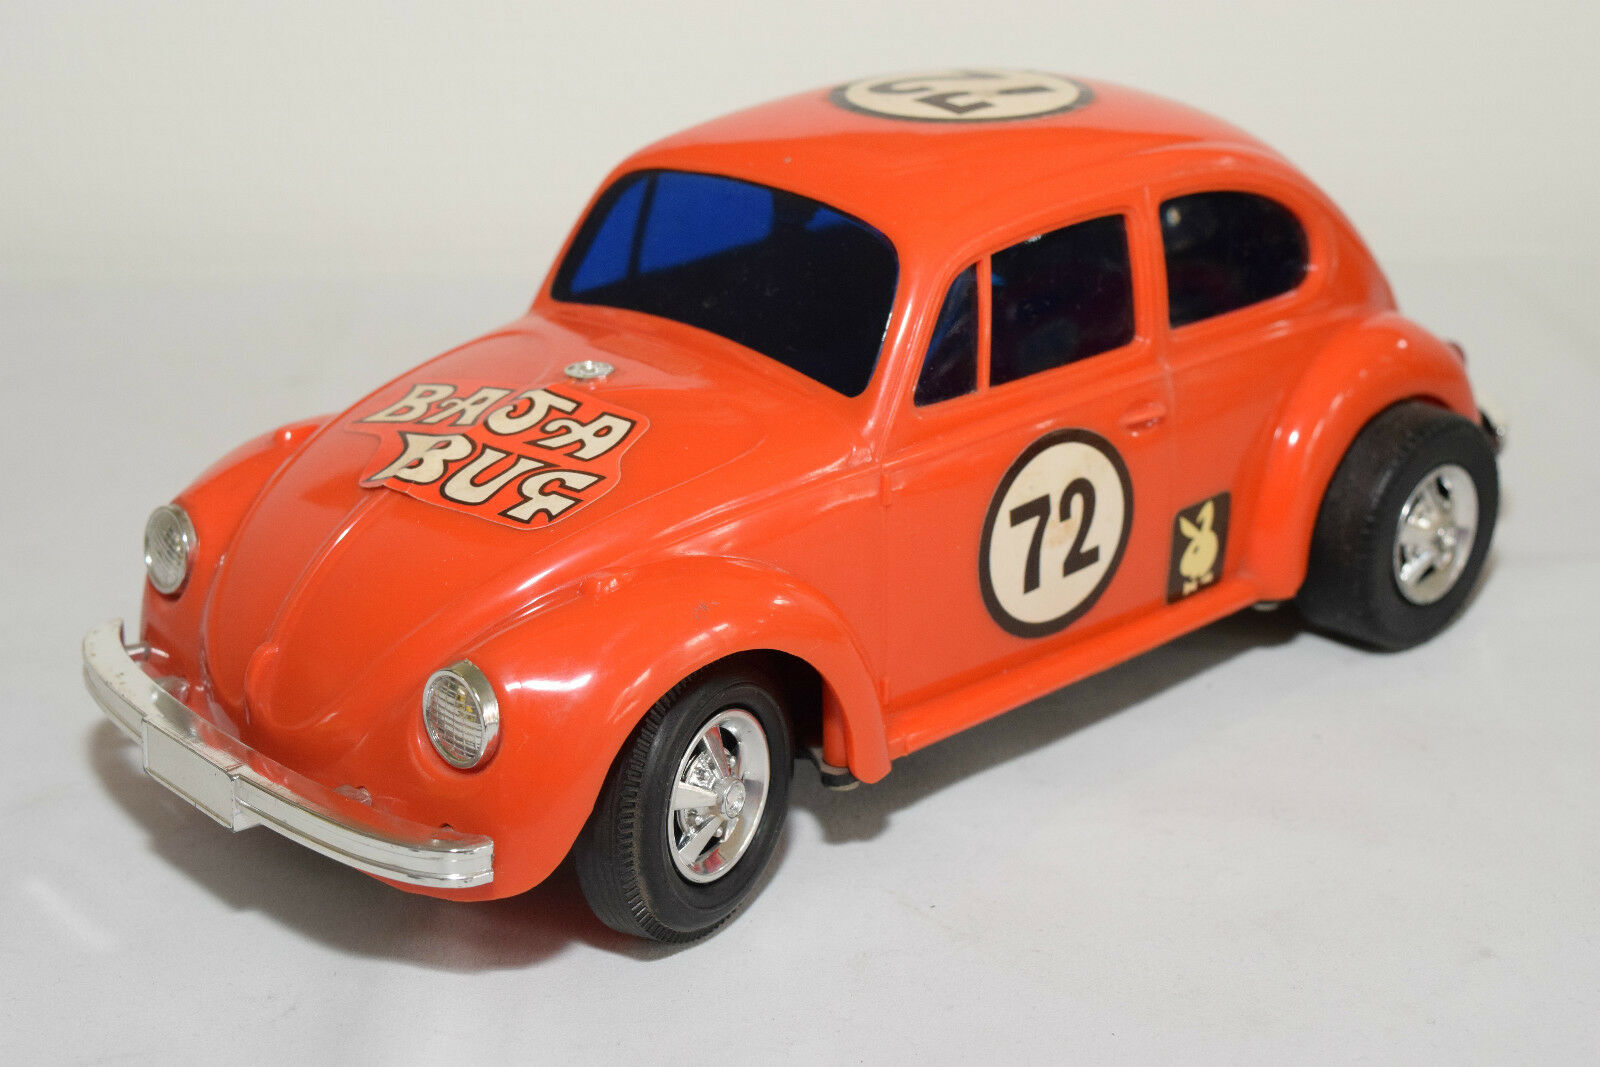 compra meglio ALPS JAPAN PLASTIC VW VOLKSWAGEN BEETLE KAFER BAJA BUG RtuttiY RtuttiY RtuttiY EXCELLENT CONDITION  marchio famoso